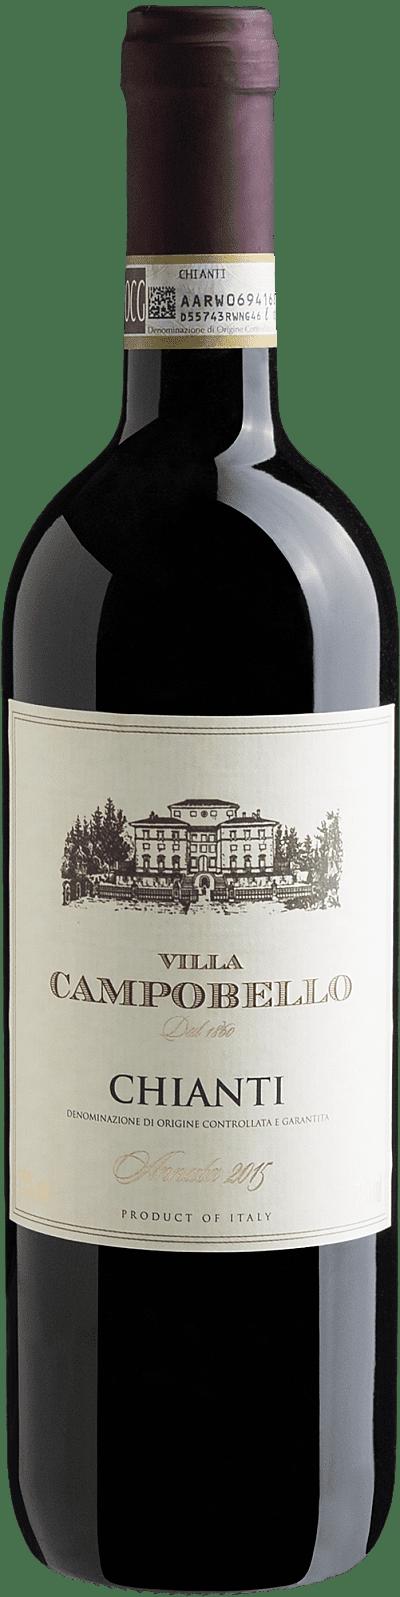 Vinho Tinto Chianti DOCG Campobello